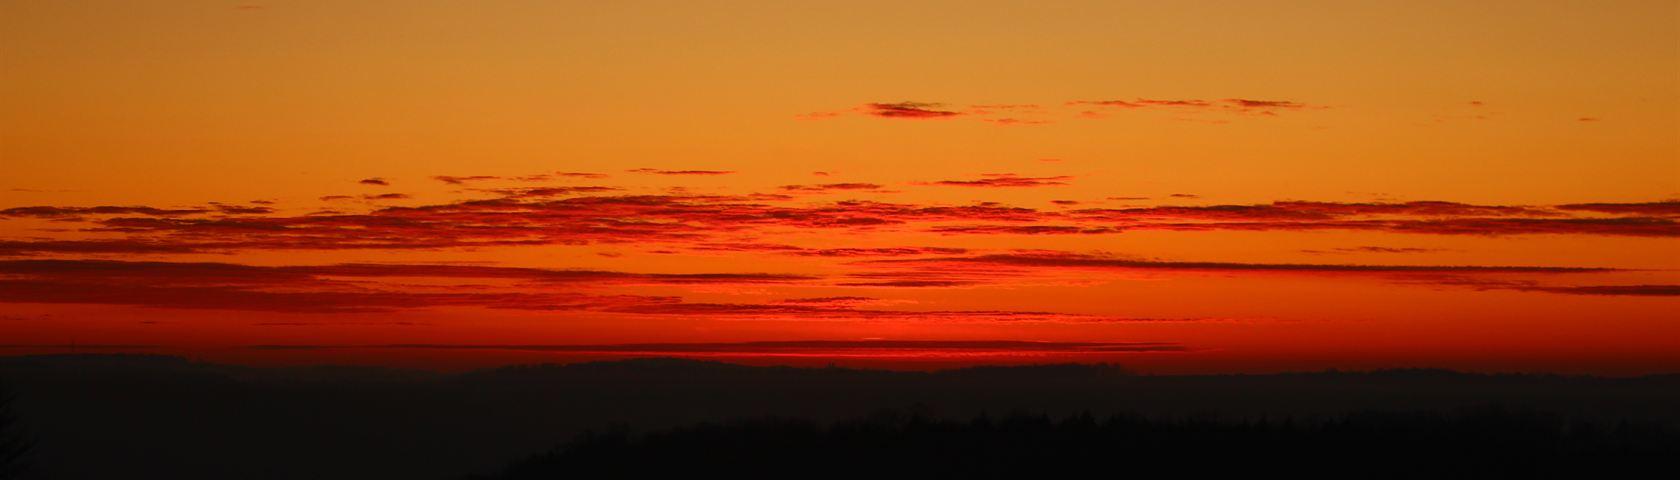 Orange Sun Over NY